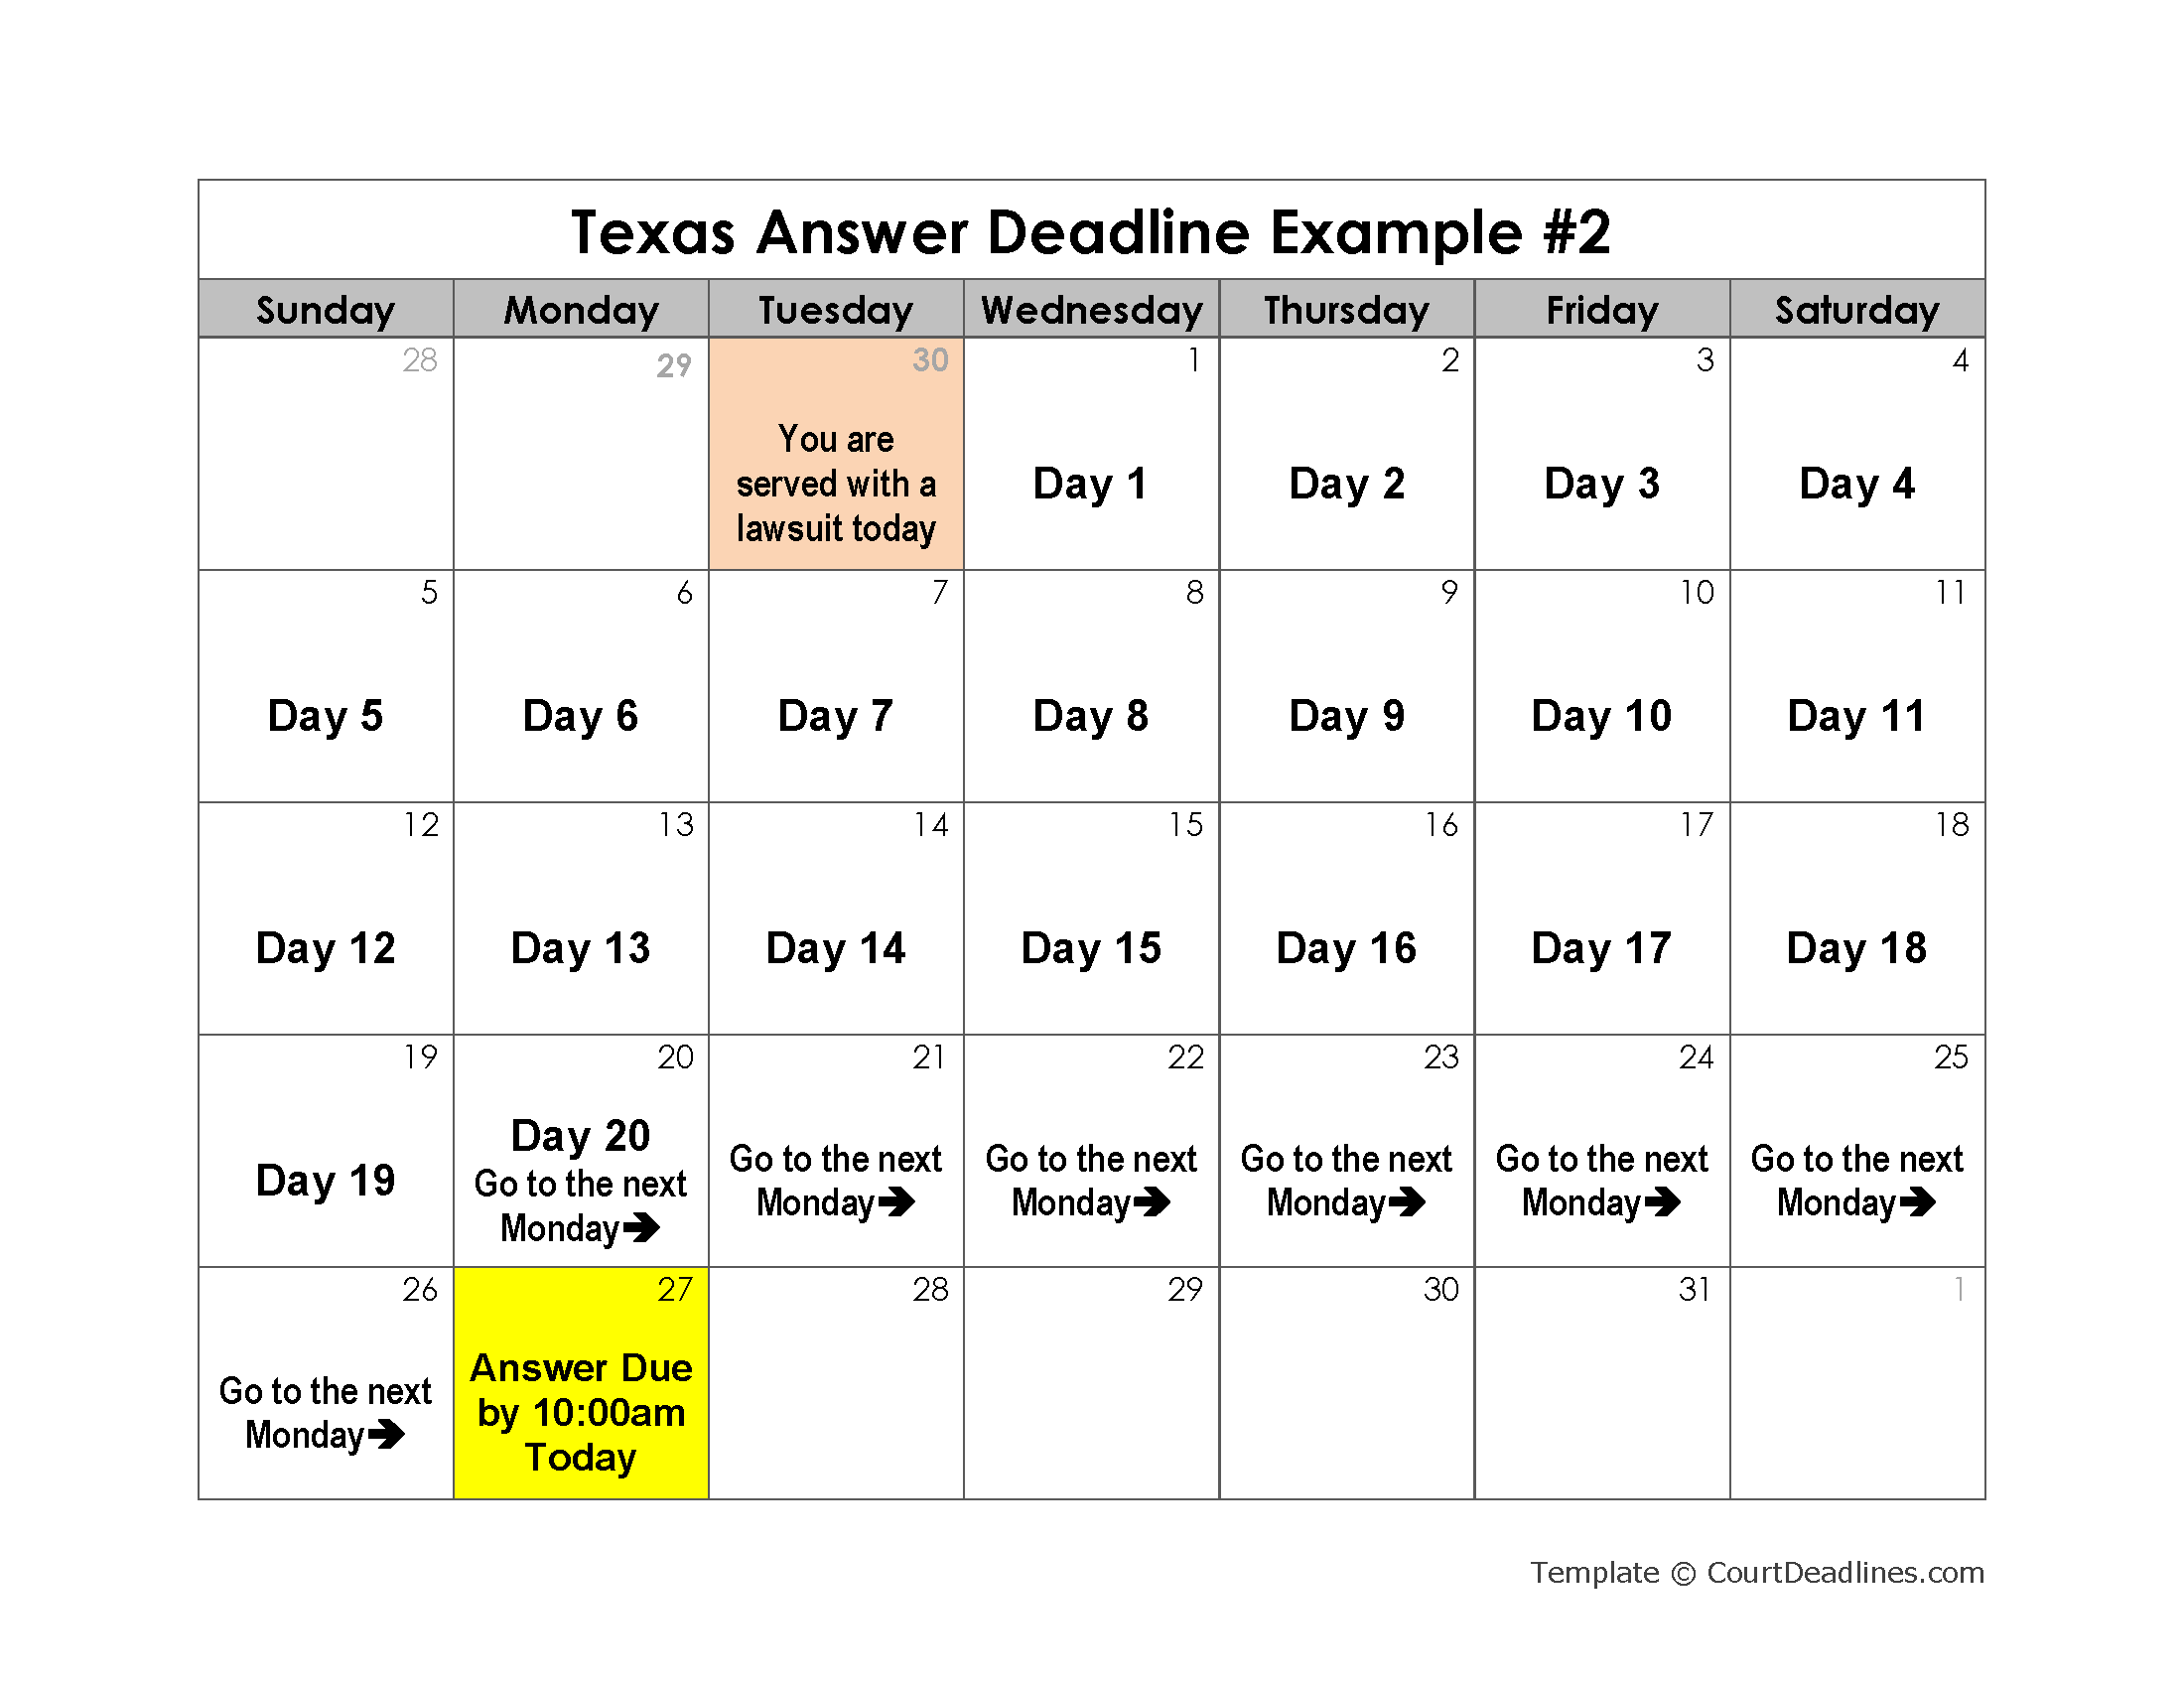 Texas Answer Deadline Example 2